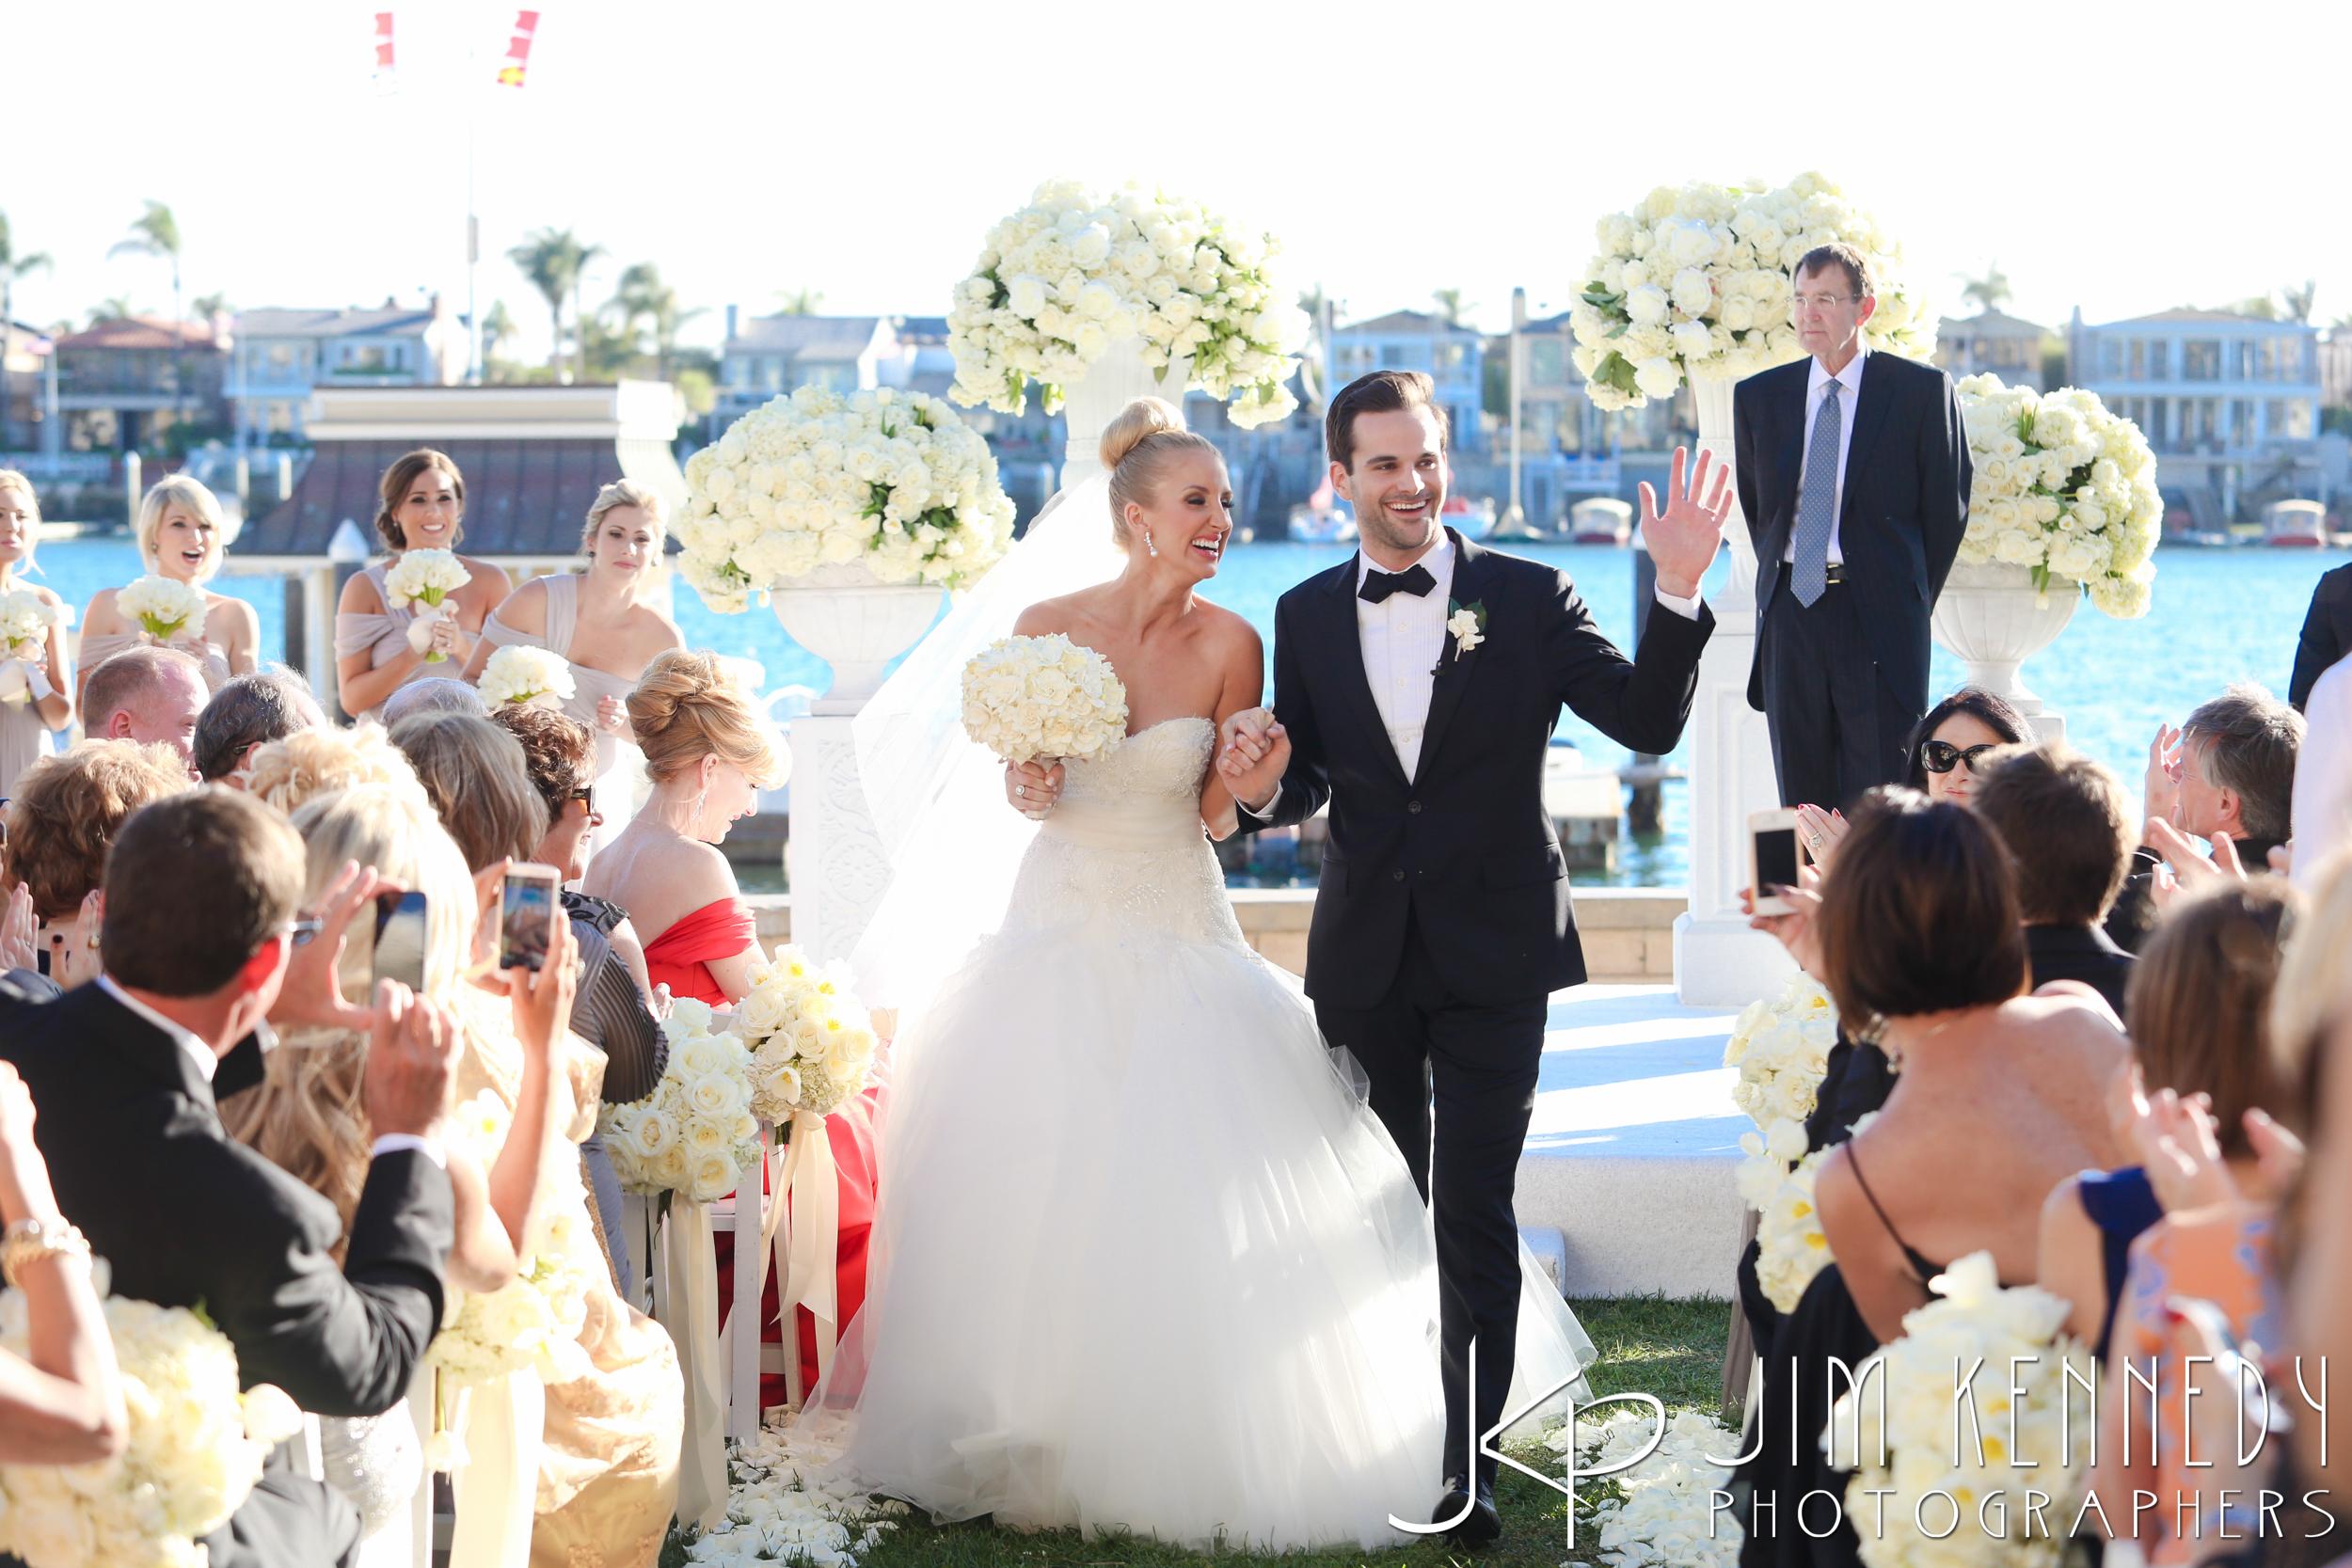 balboa-bay-resort-wedding-photography_0110.JPG